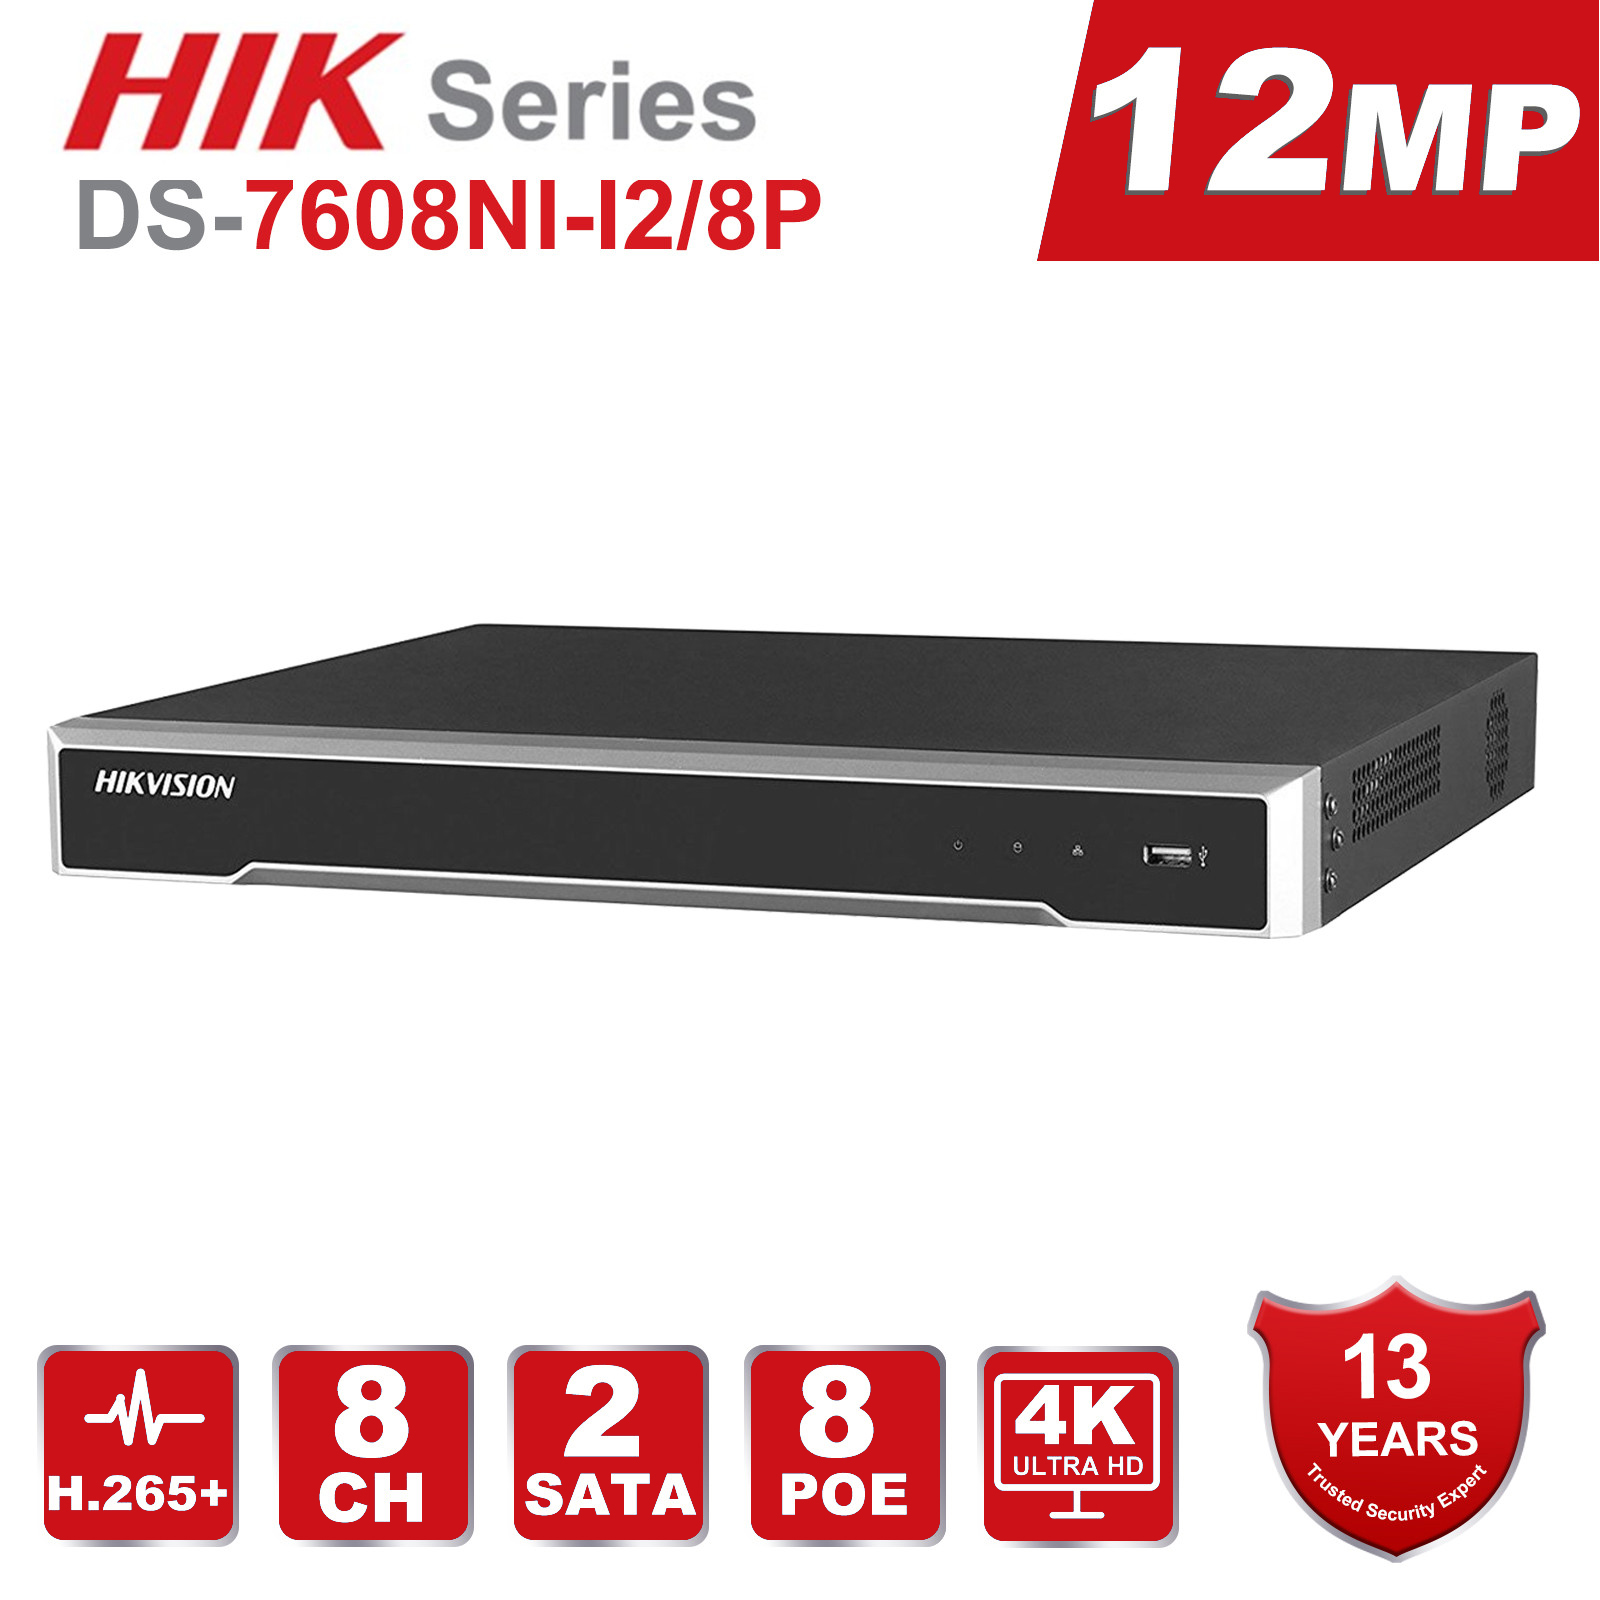 HIKVISION OEM 4K 8CH DS-7608NI-K2//8P POE 8MP NVR CCTV Security Network Recorder